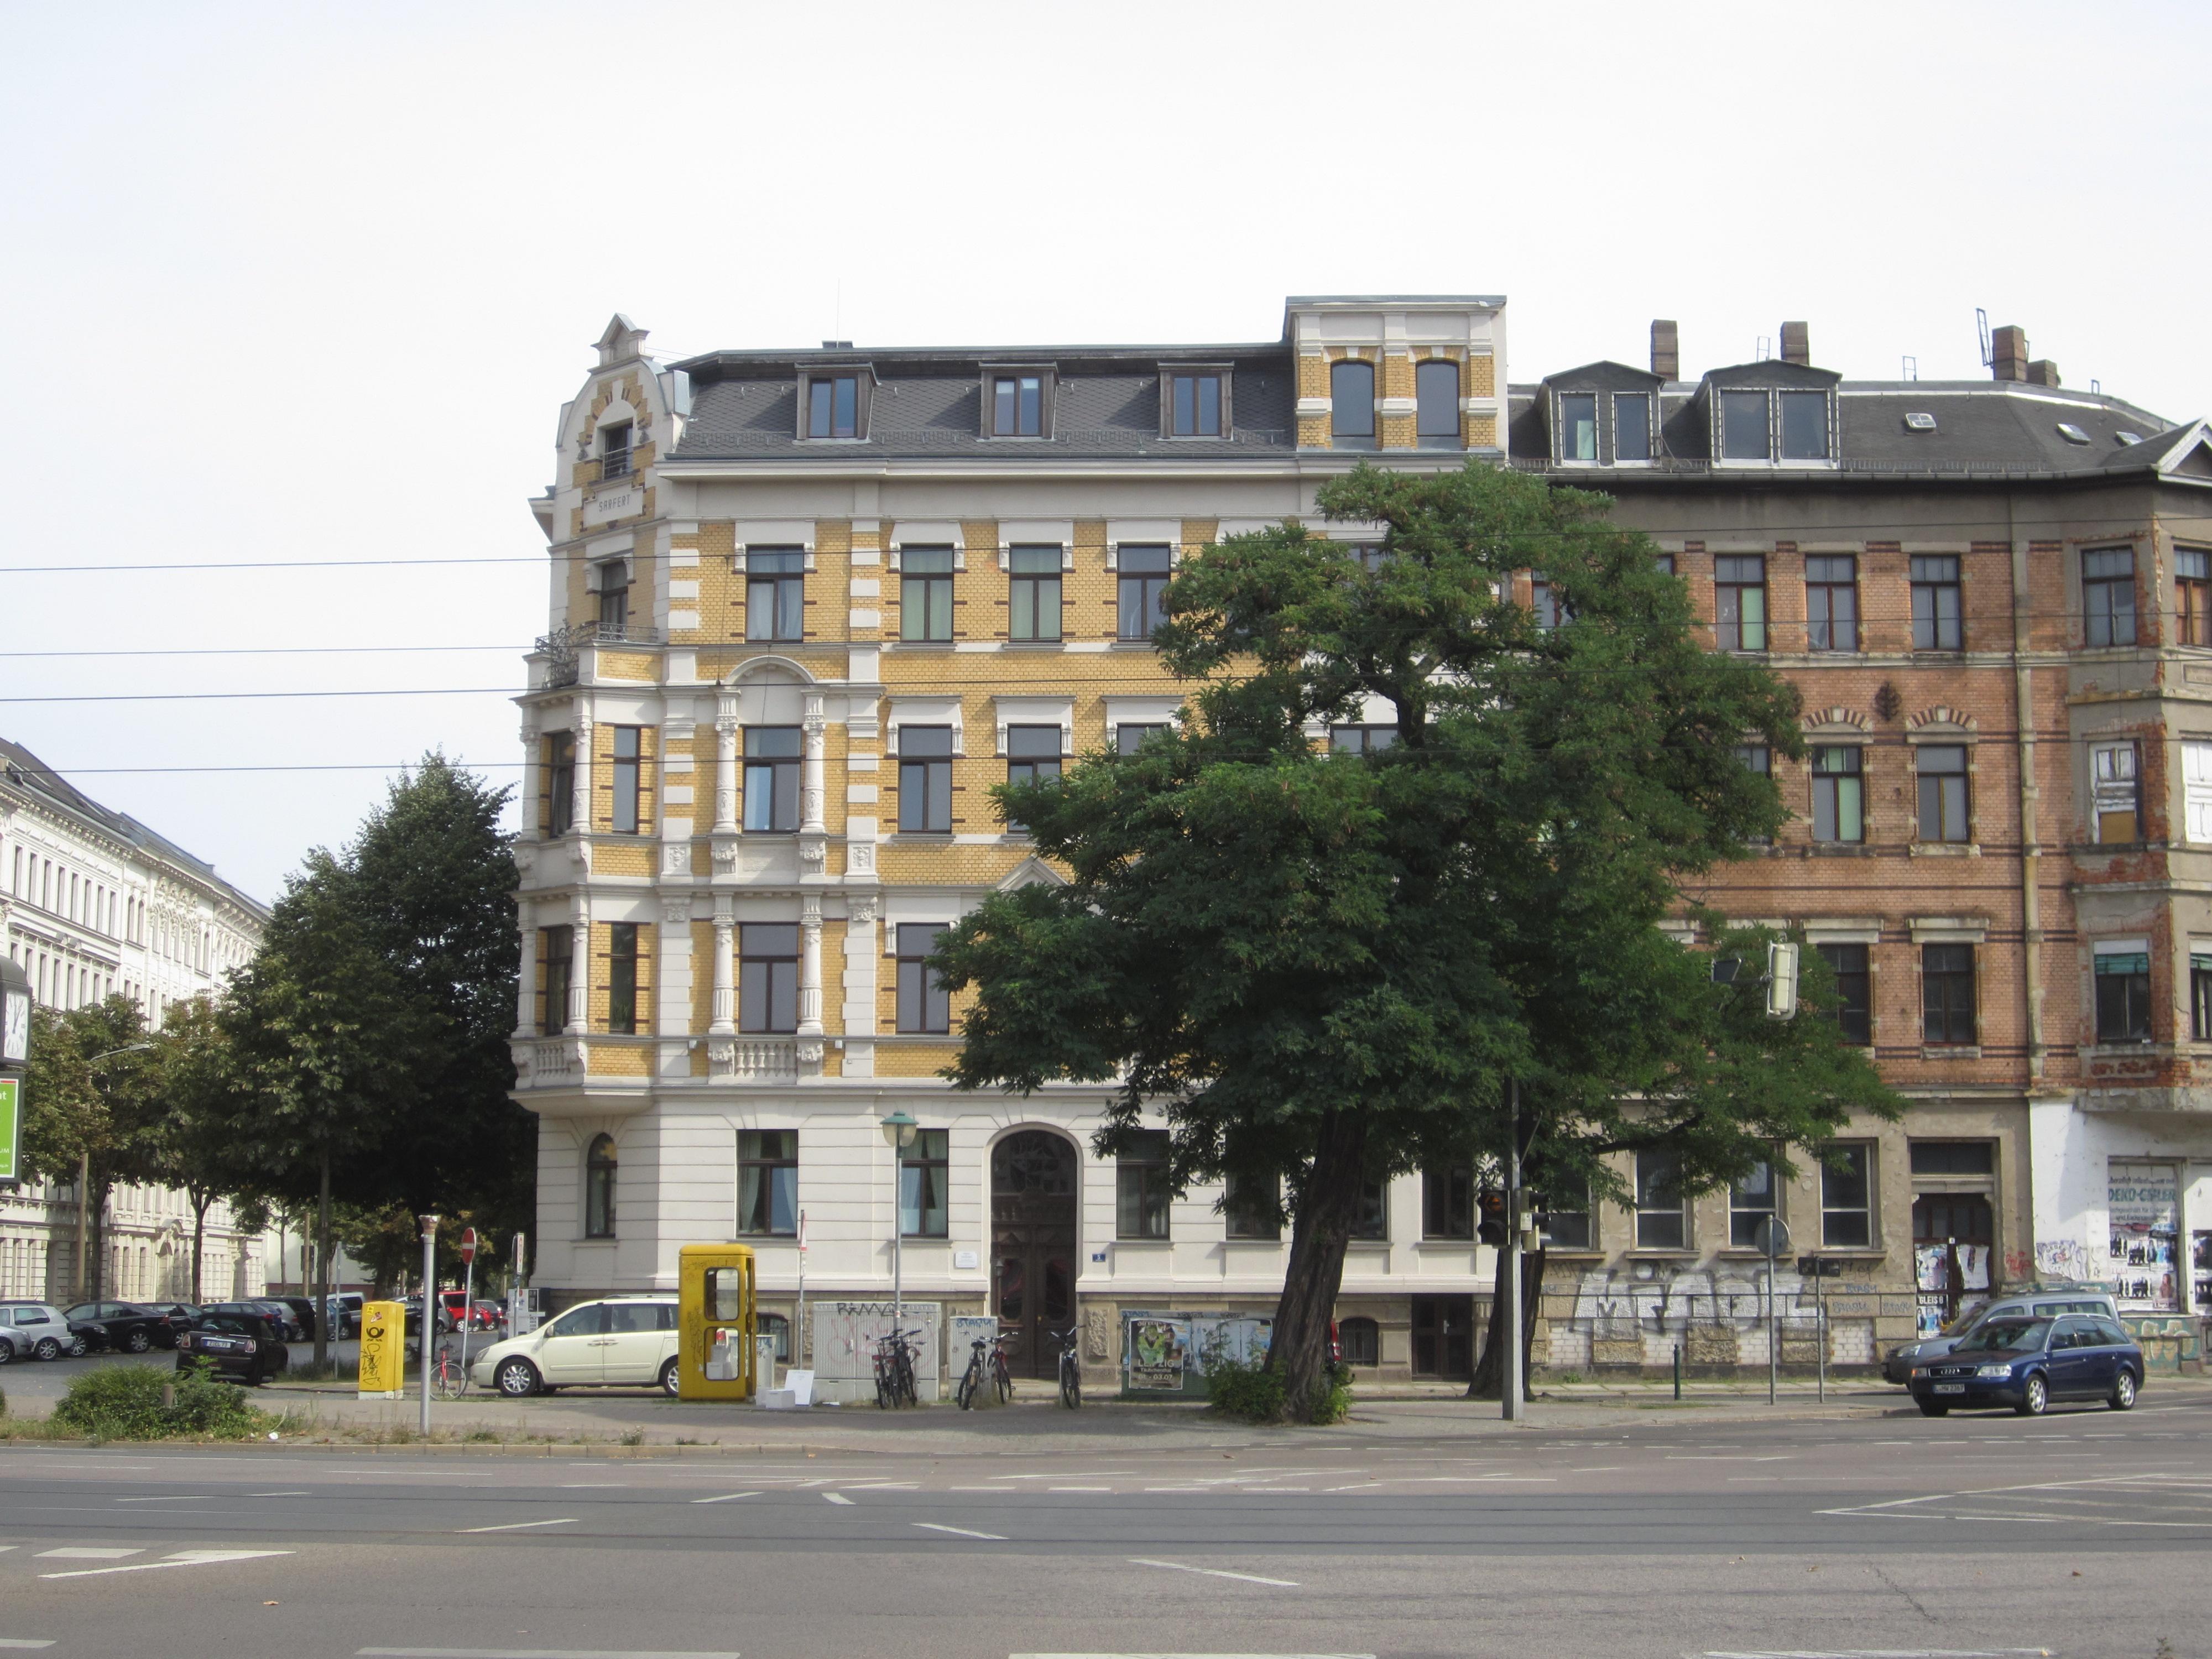 Ostplatz Leipzig file ostplatz leipzig 2016 006 jpg wikimedia commons